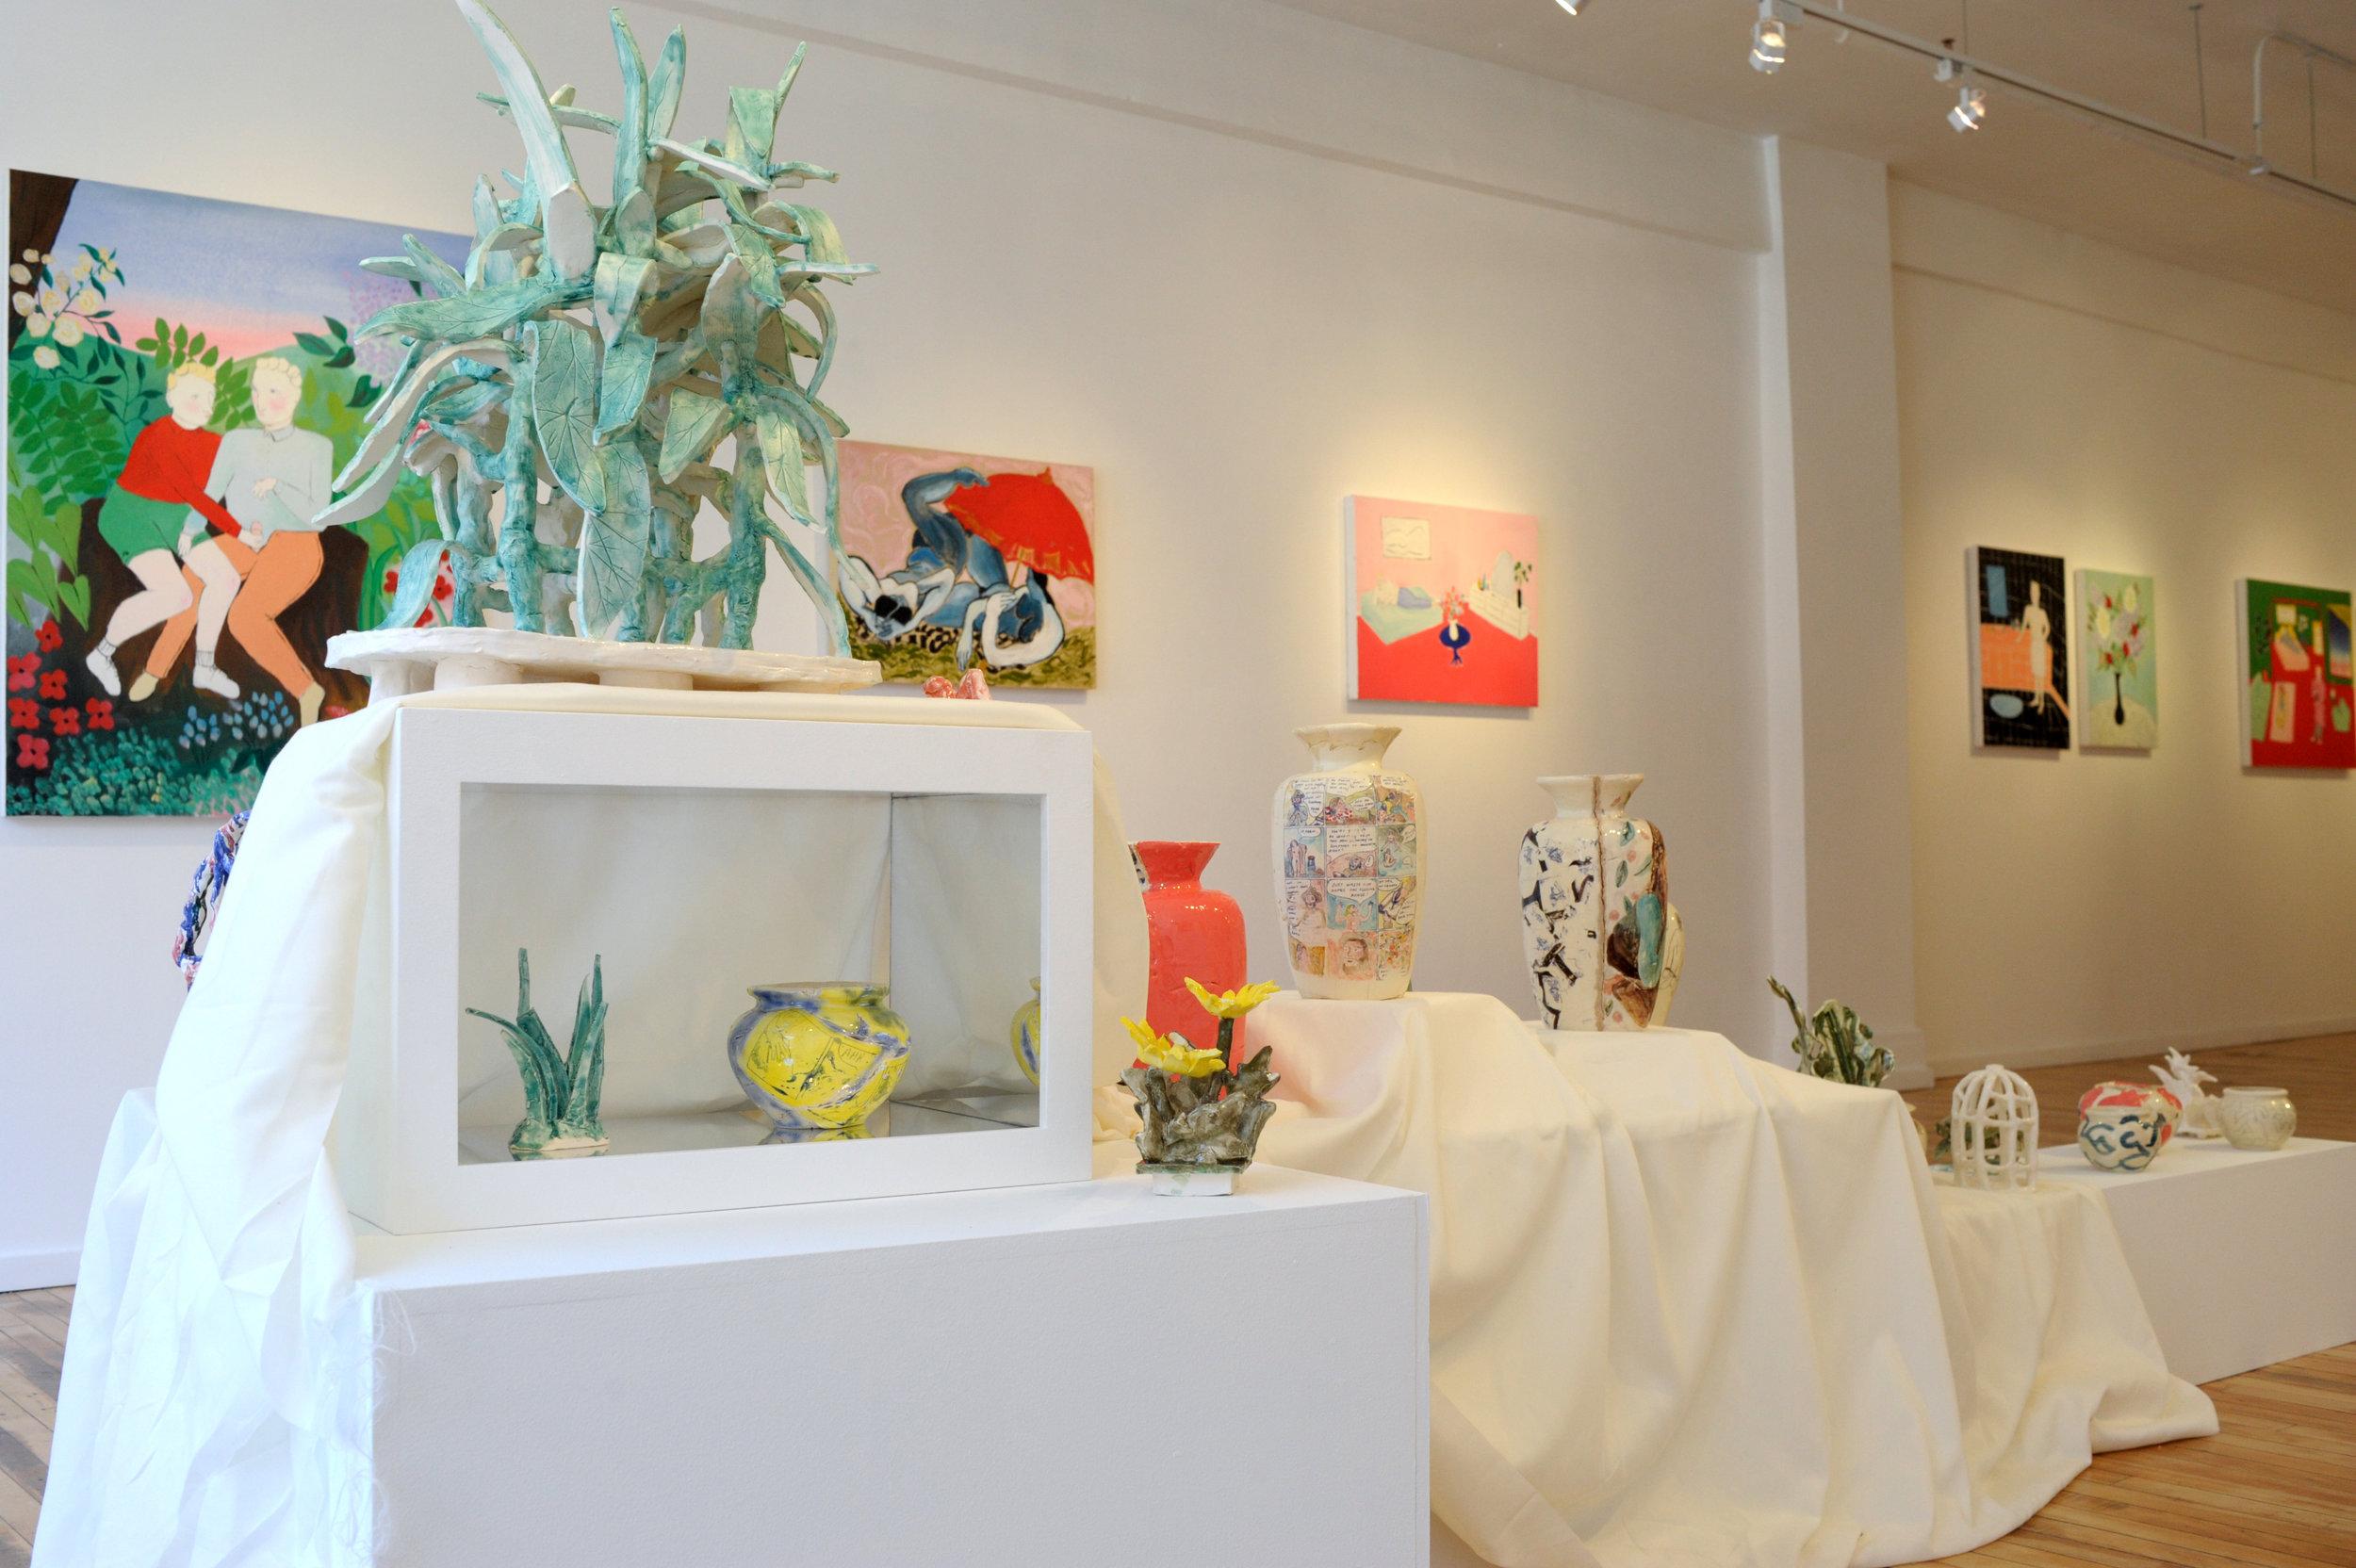 WestWall_ceramics + Paintings by all.JPG